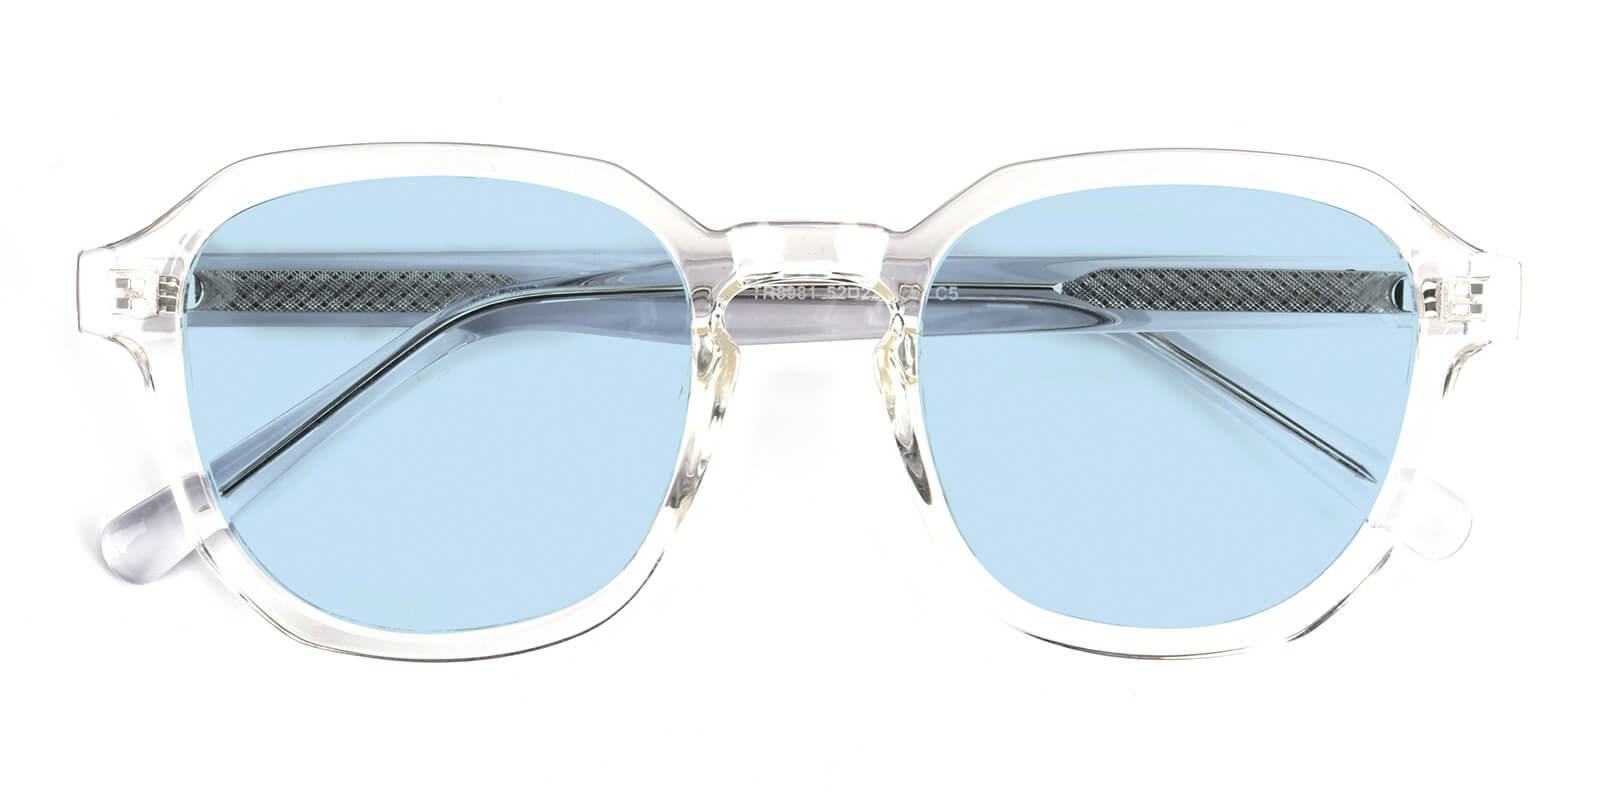 Kasia Translucent Acetate SpringHinges , Sunglasses , UniversalBridgeFit Frames from ABBE Glasses